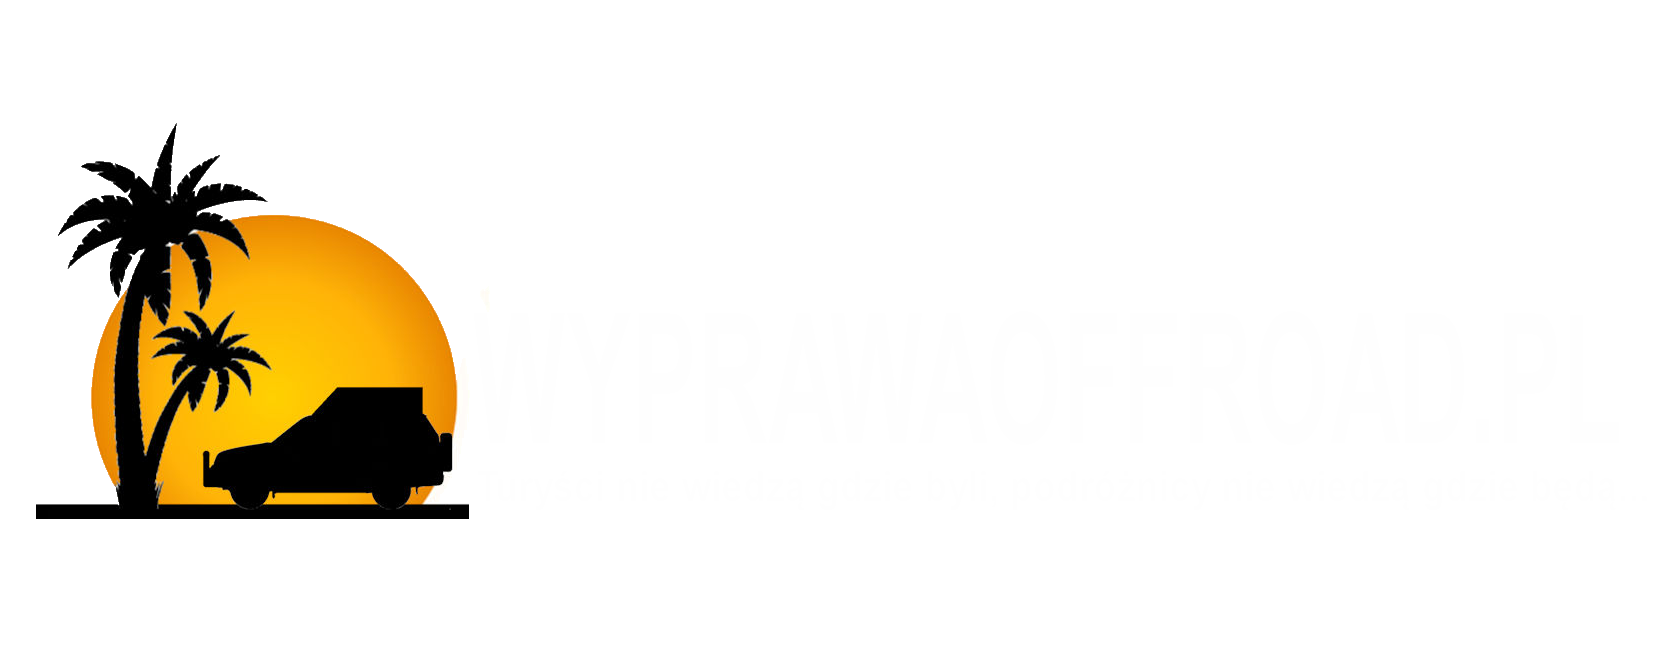 WYPRAWAOFFROAD. PL